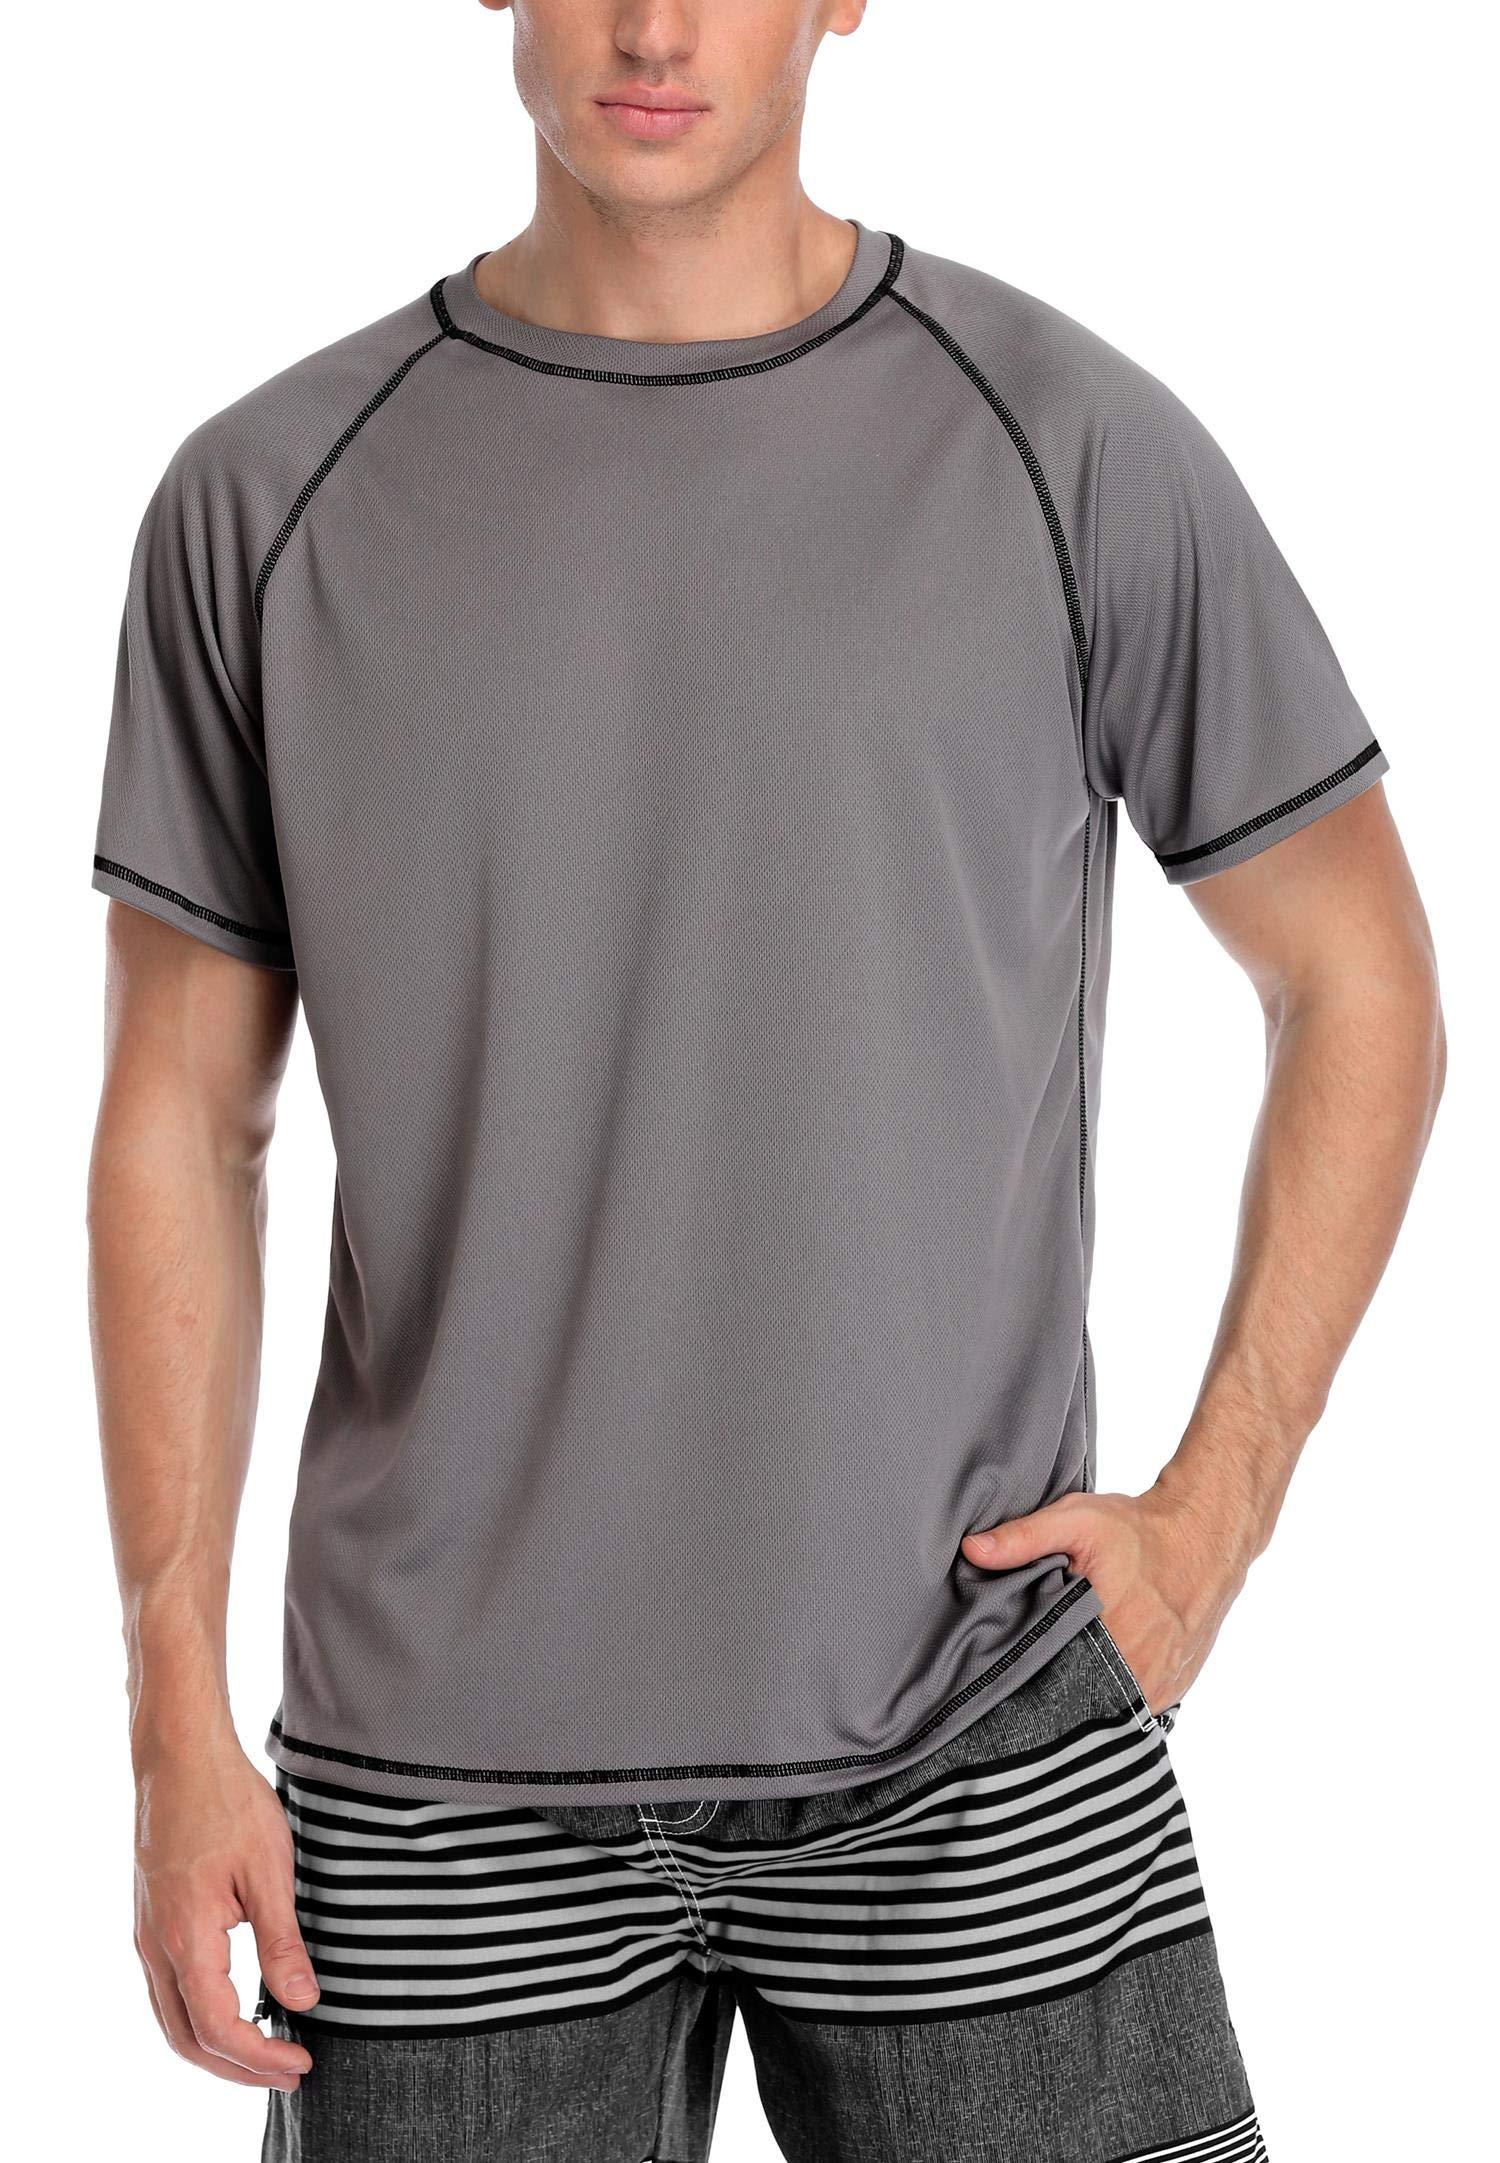 6eab010c ATTRACO Men's Rashguard Swim Tee Short Sleeve Sun Protection Shirt Loose  Fit product image